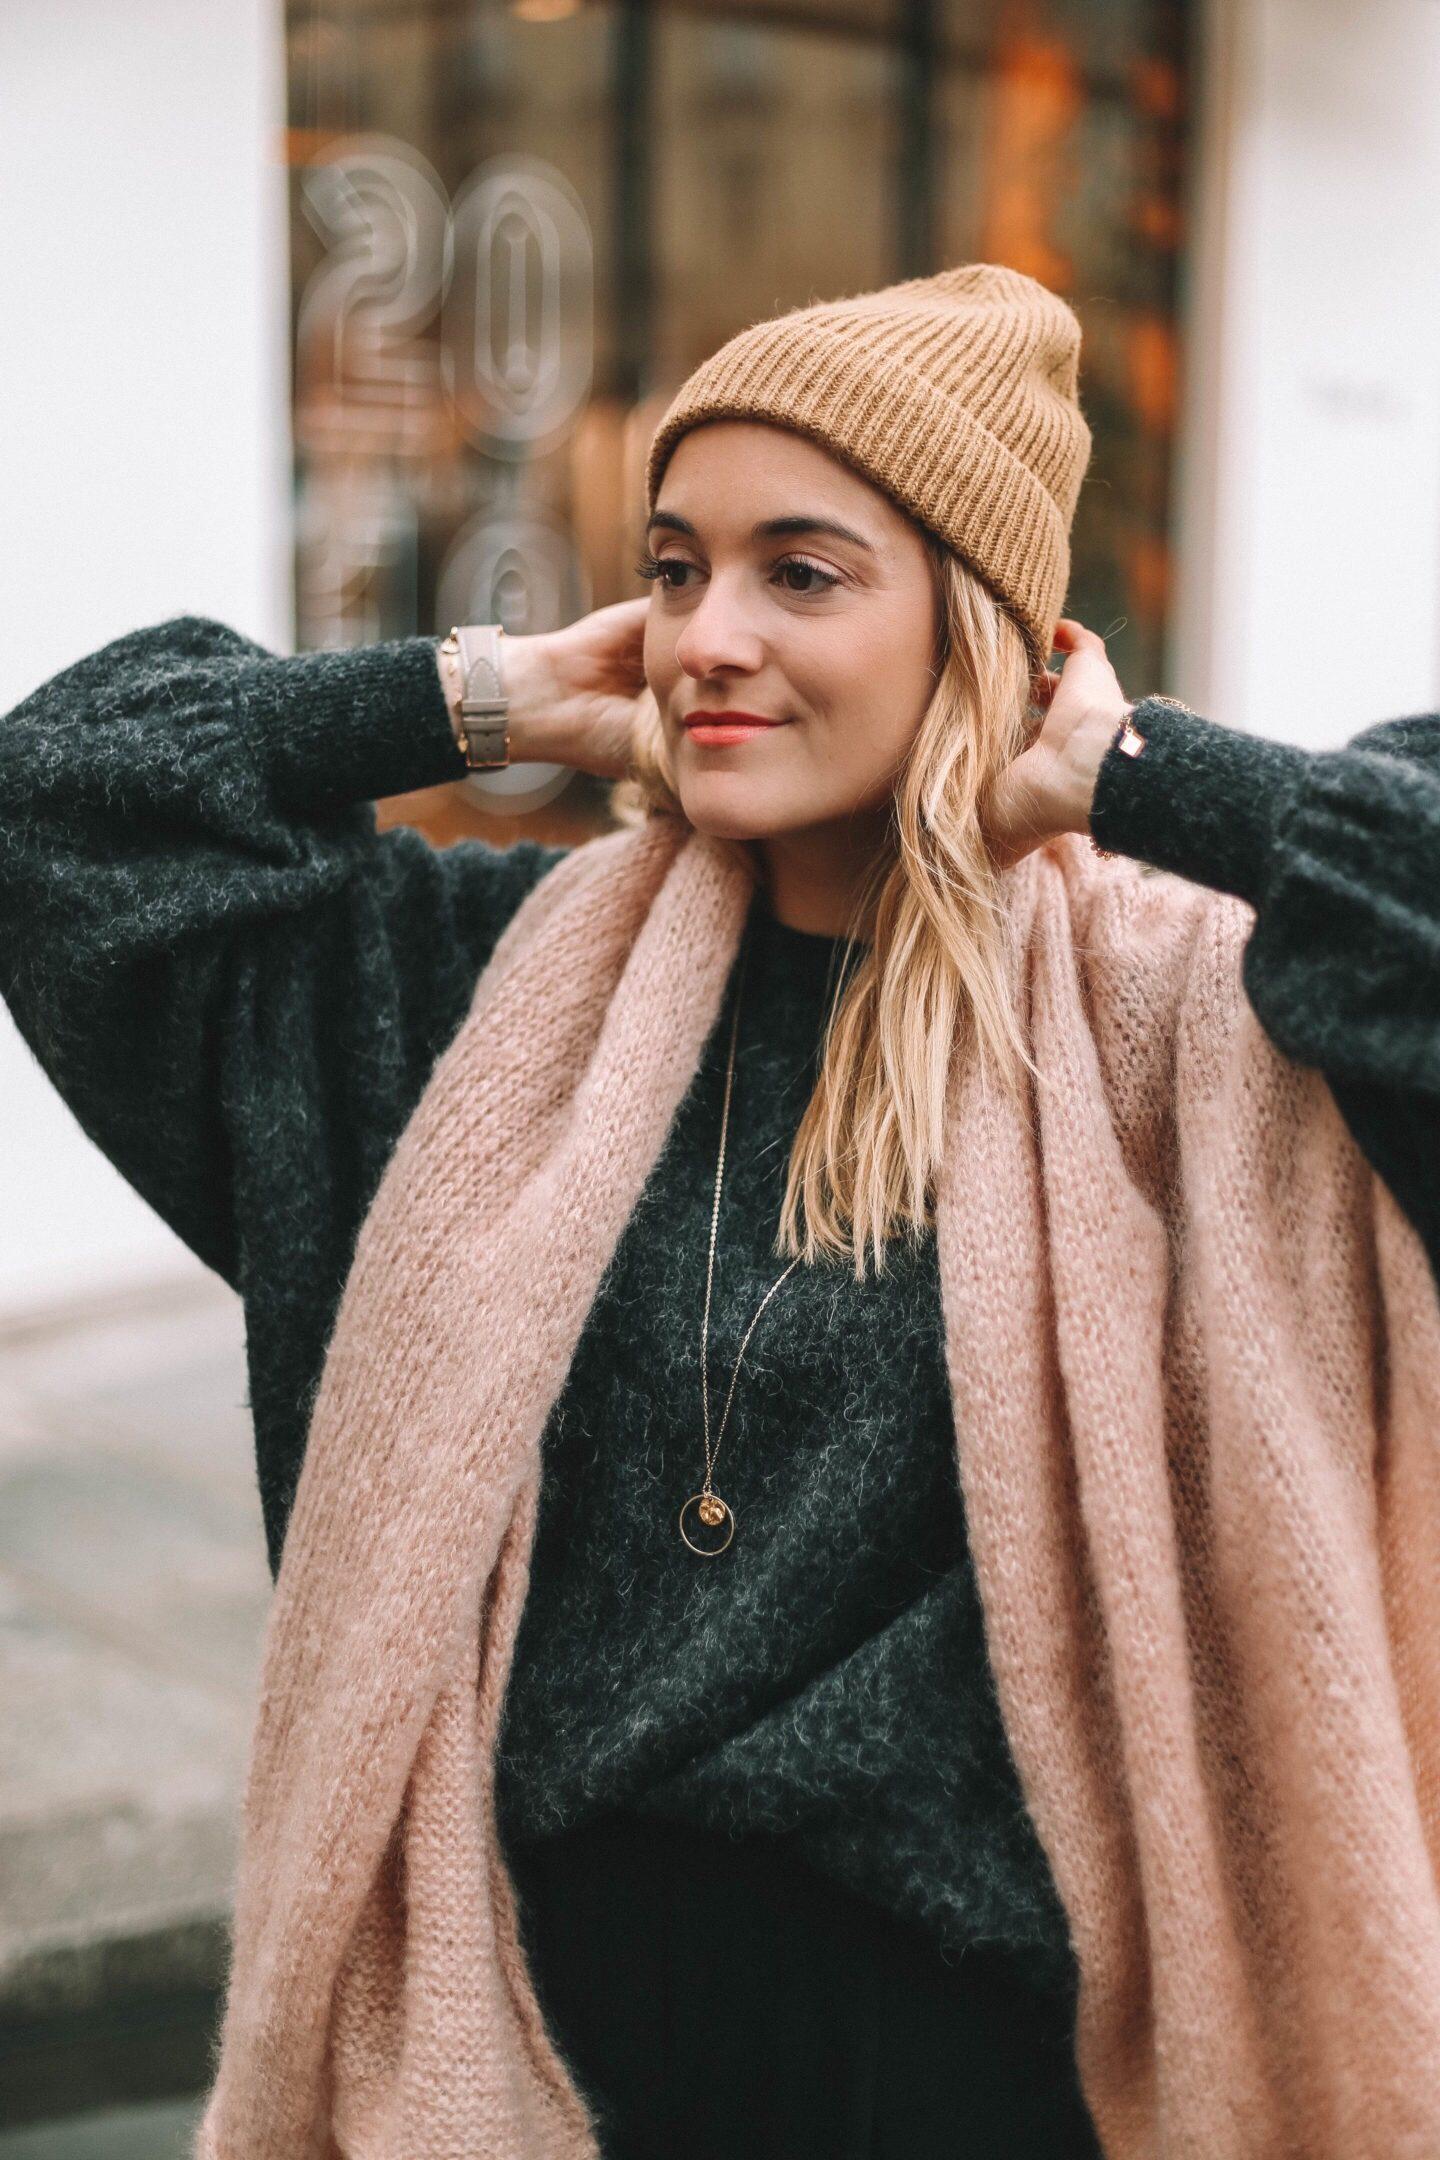 Bonnet Camel h&m - Blondie baby blog mode et voyages